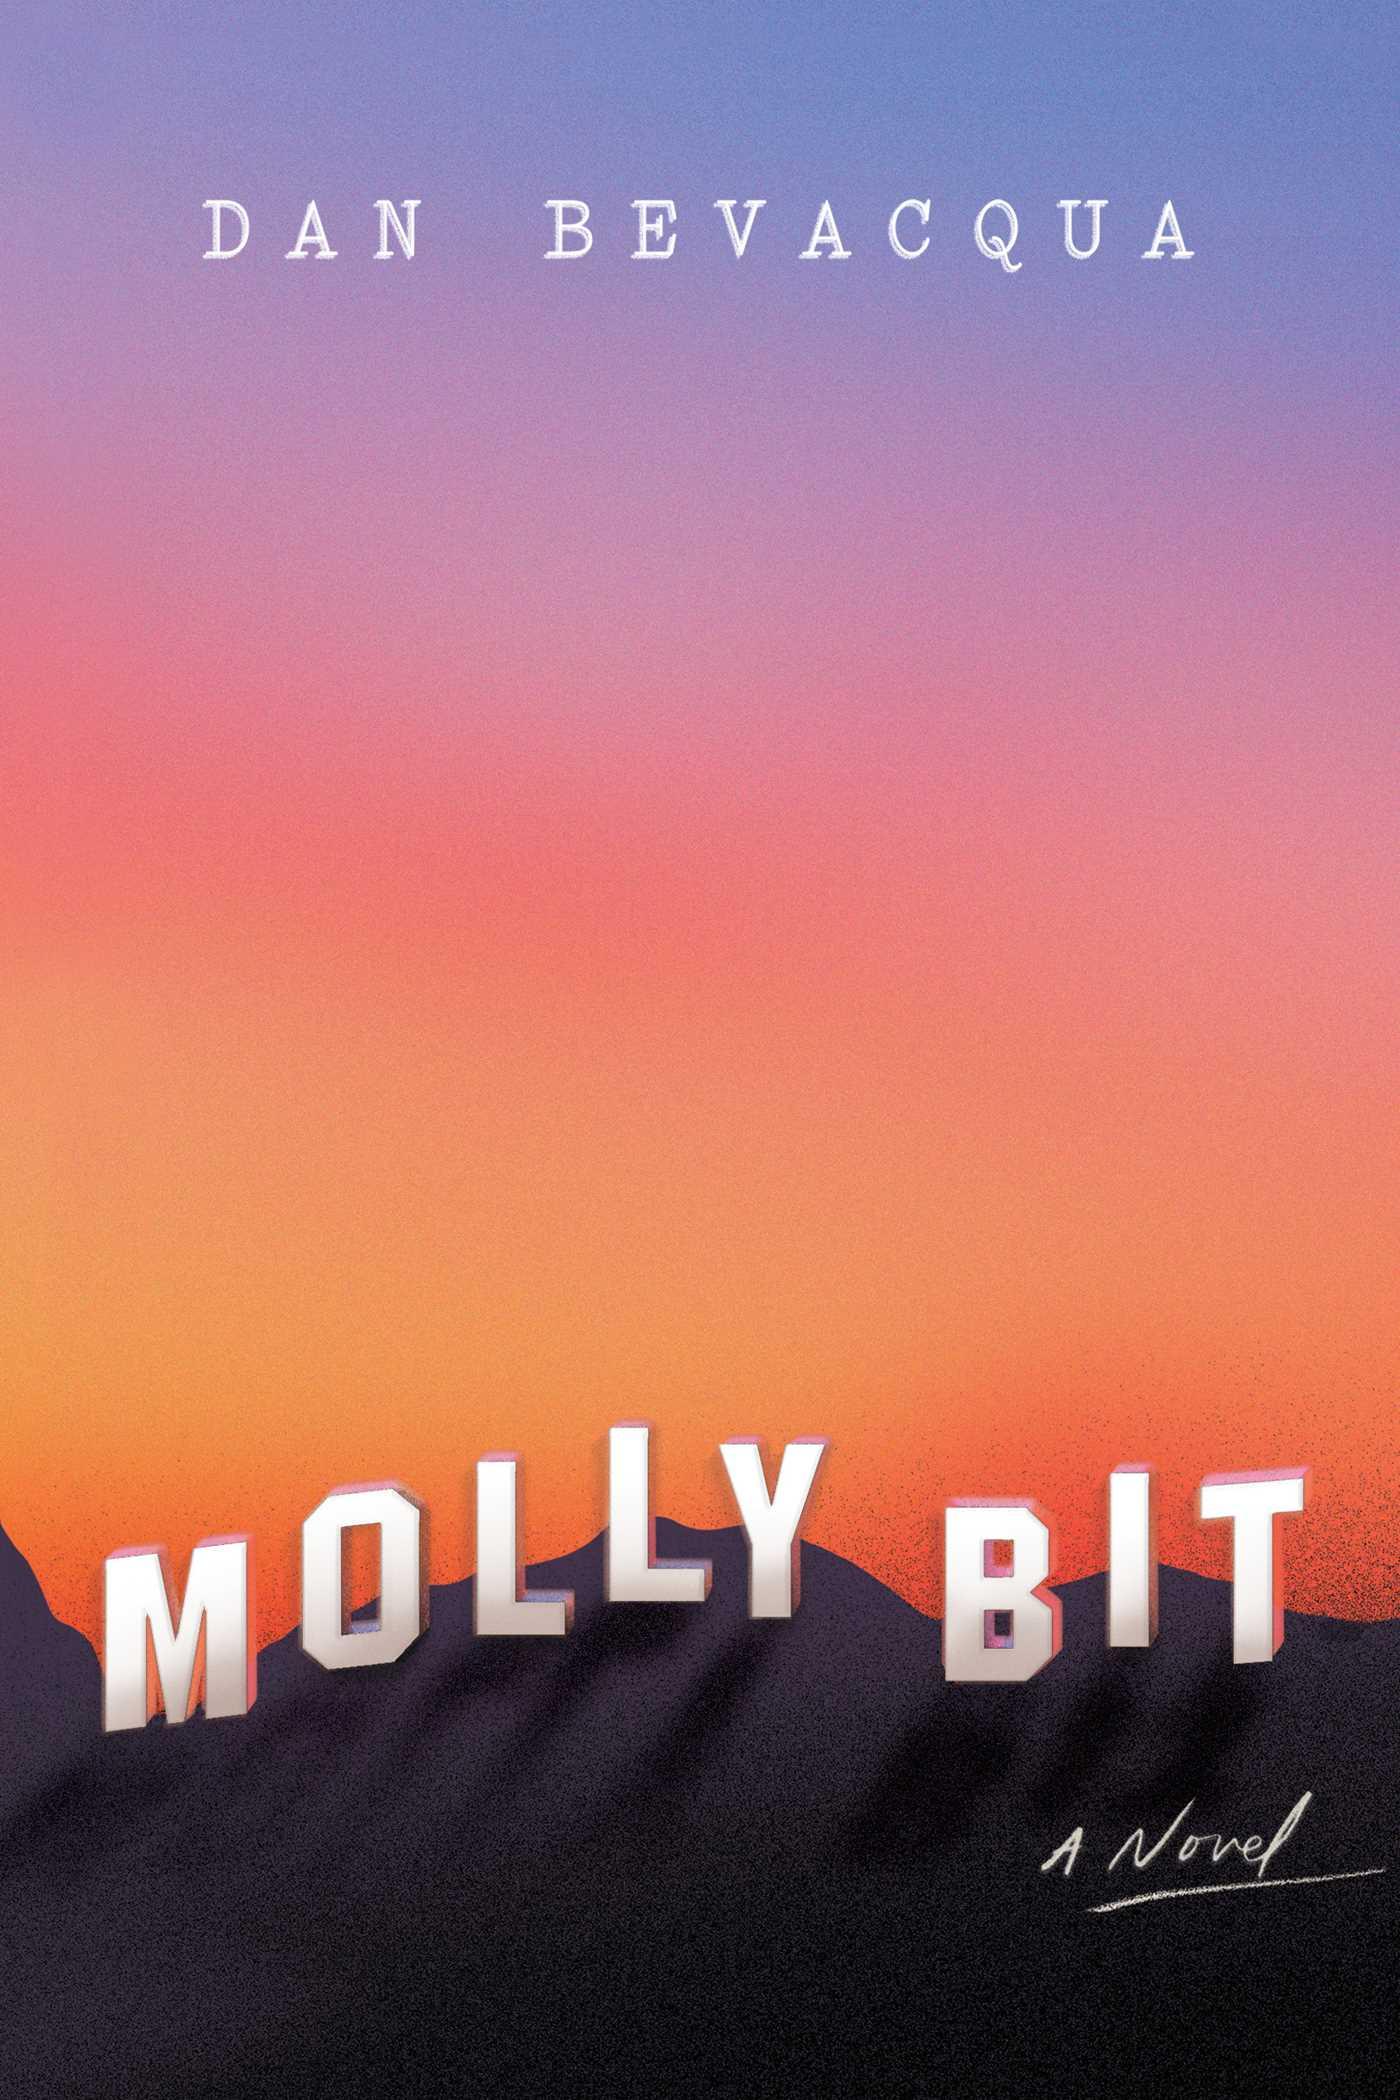 Molly Bit